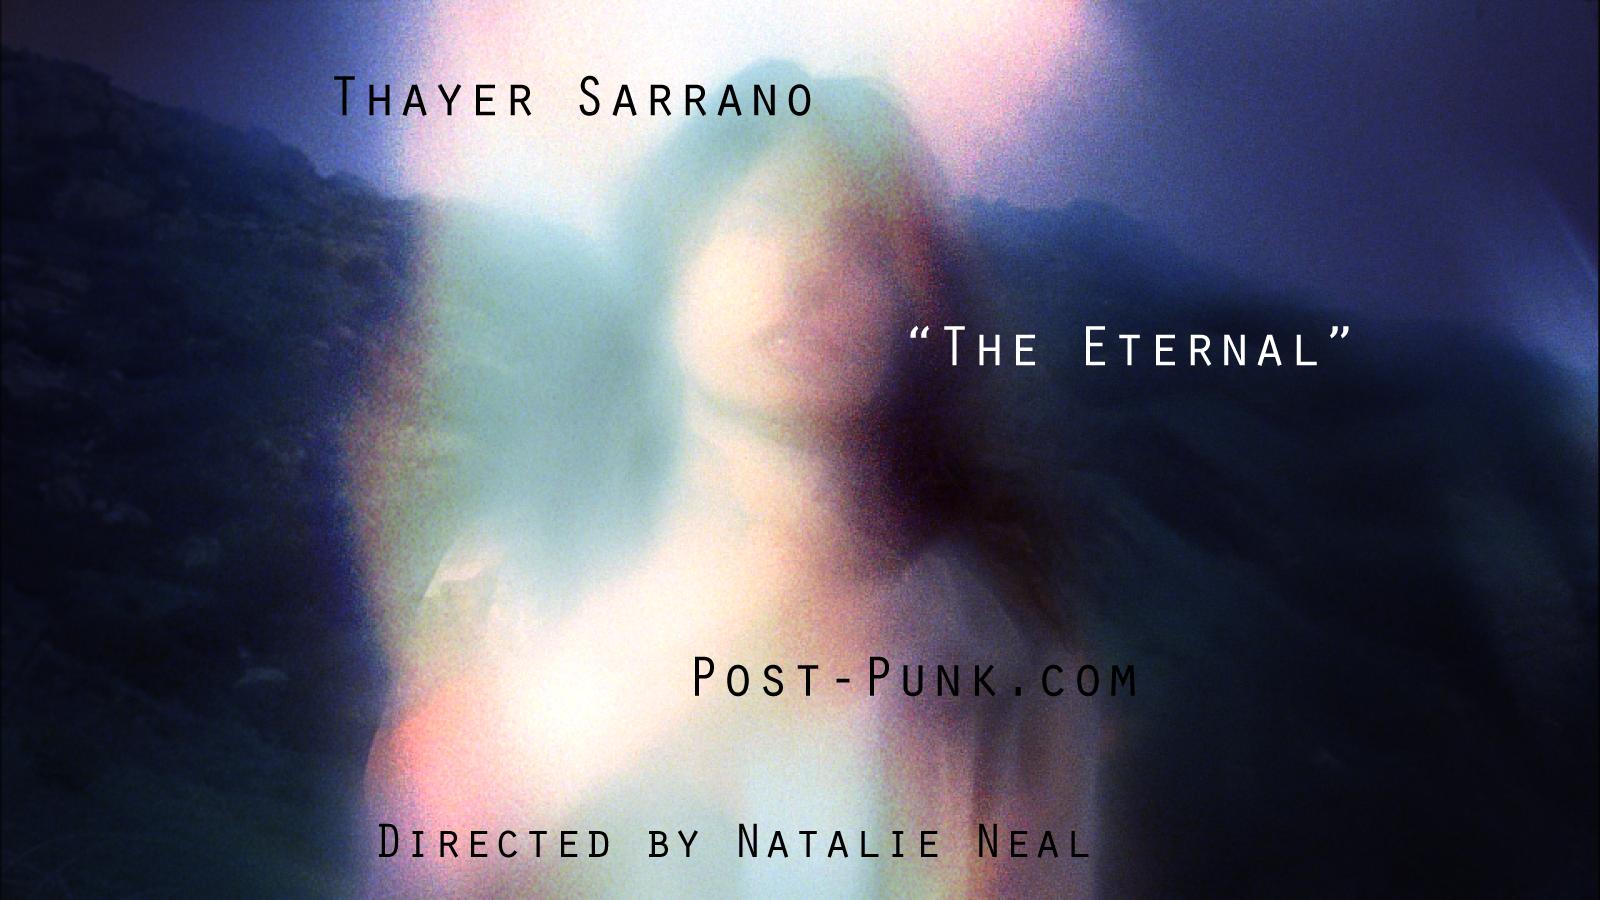 Thayer Sarrano - The Eternal - Post-Punk.com - Natalie Neal (Director)